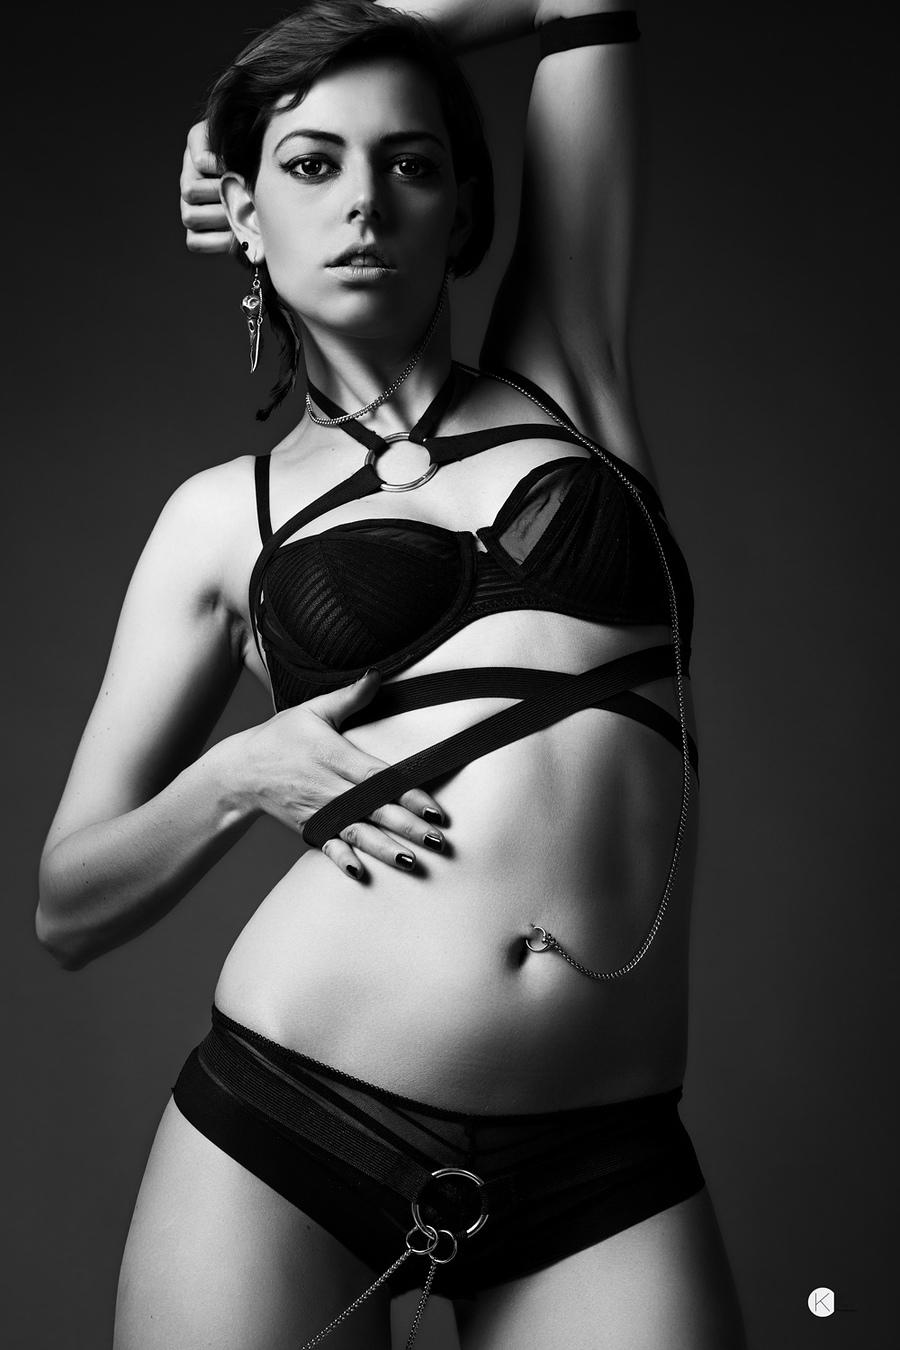 Bodybinds / Photography by Kirsten Thys van den Audenaerde, Model Riona Neve / Uploaded 30th August 2013 @ 11:21 AM